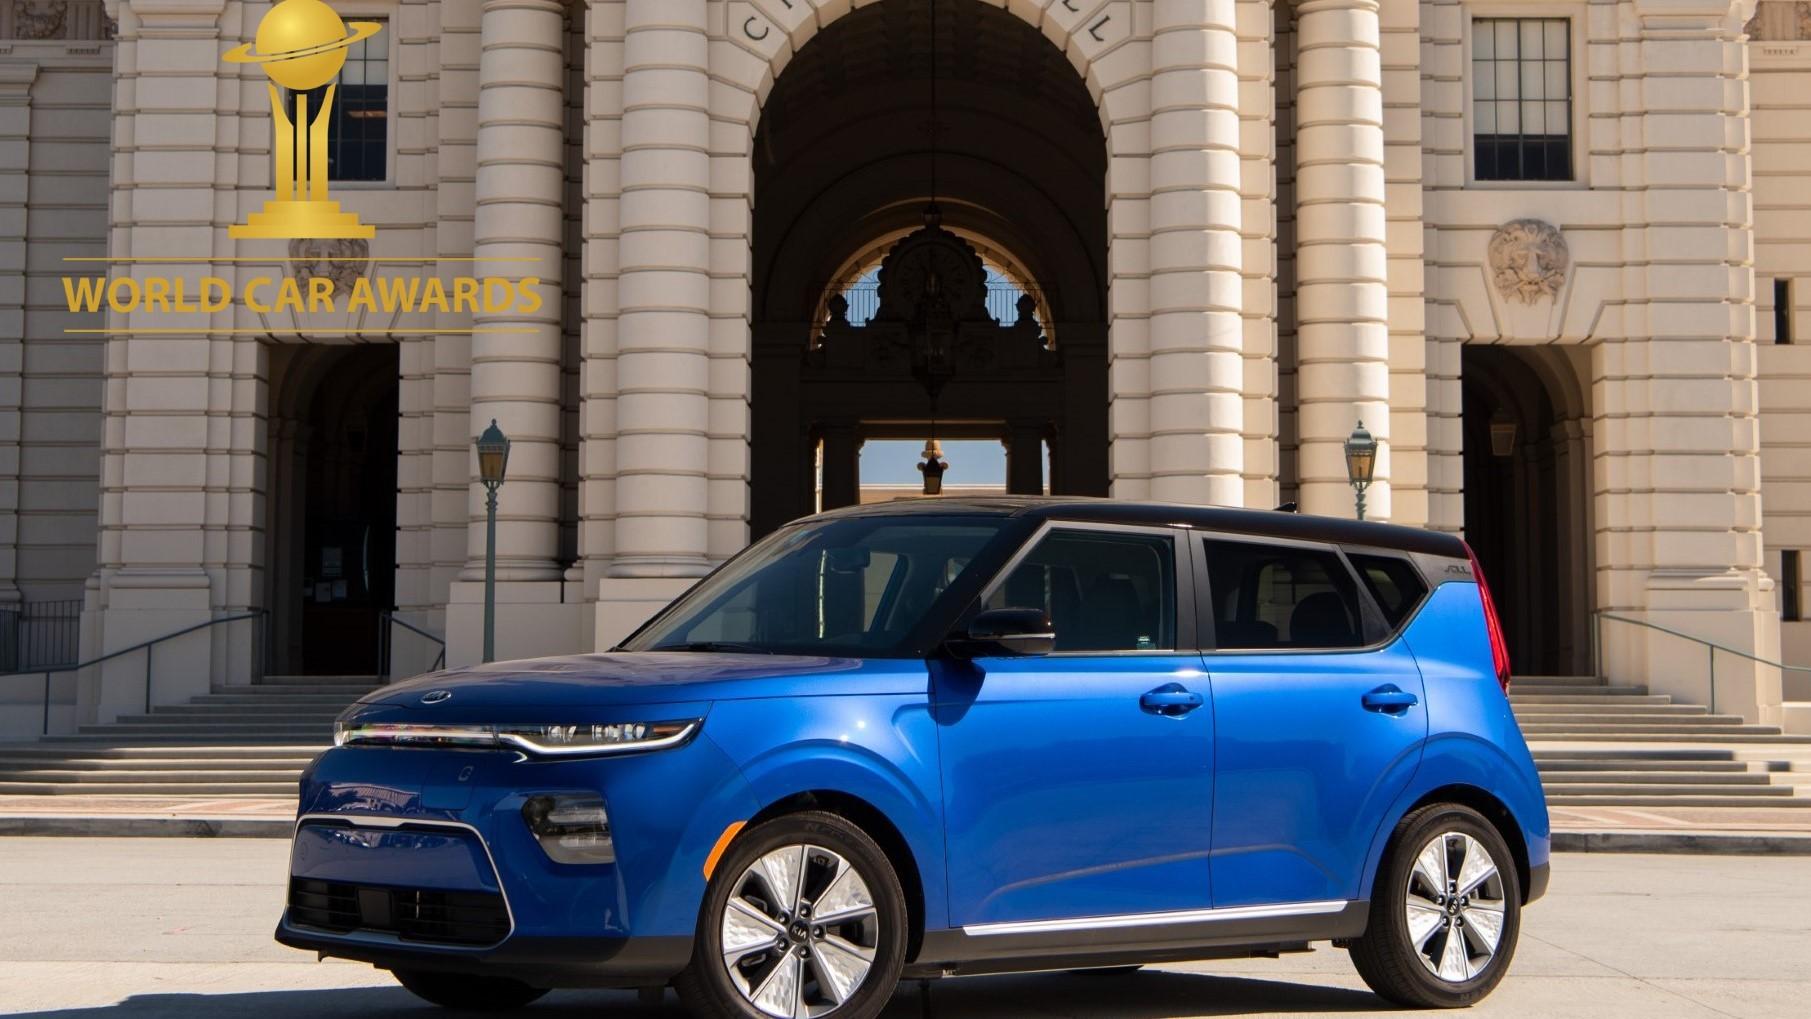 2020 World Car Awards Soul EV